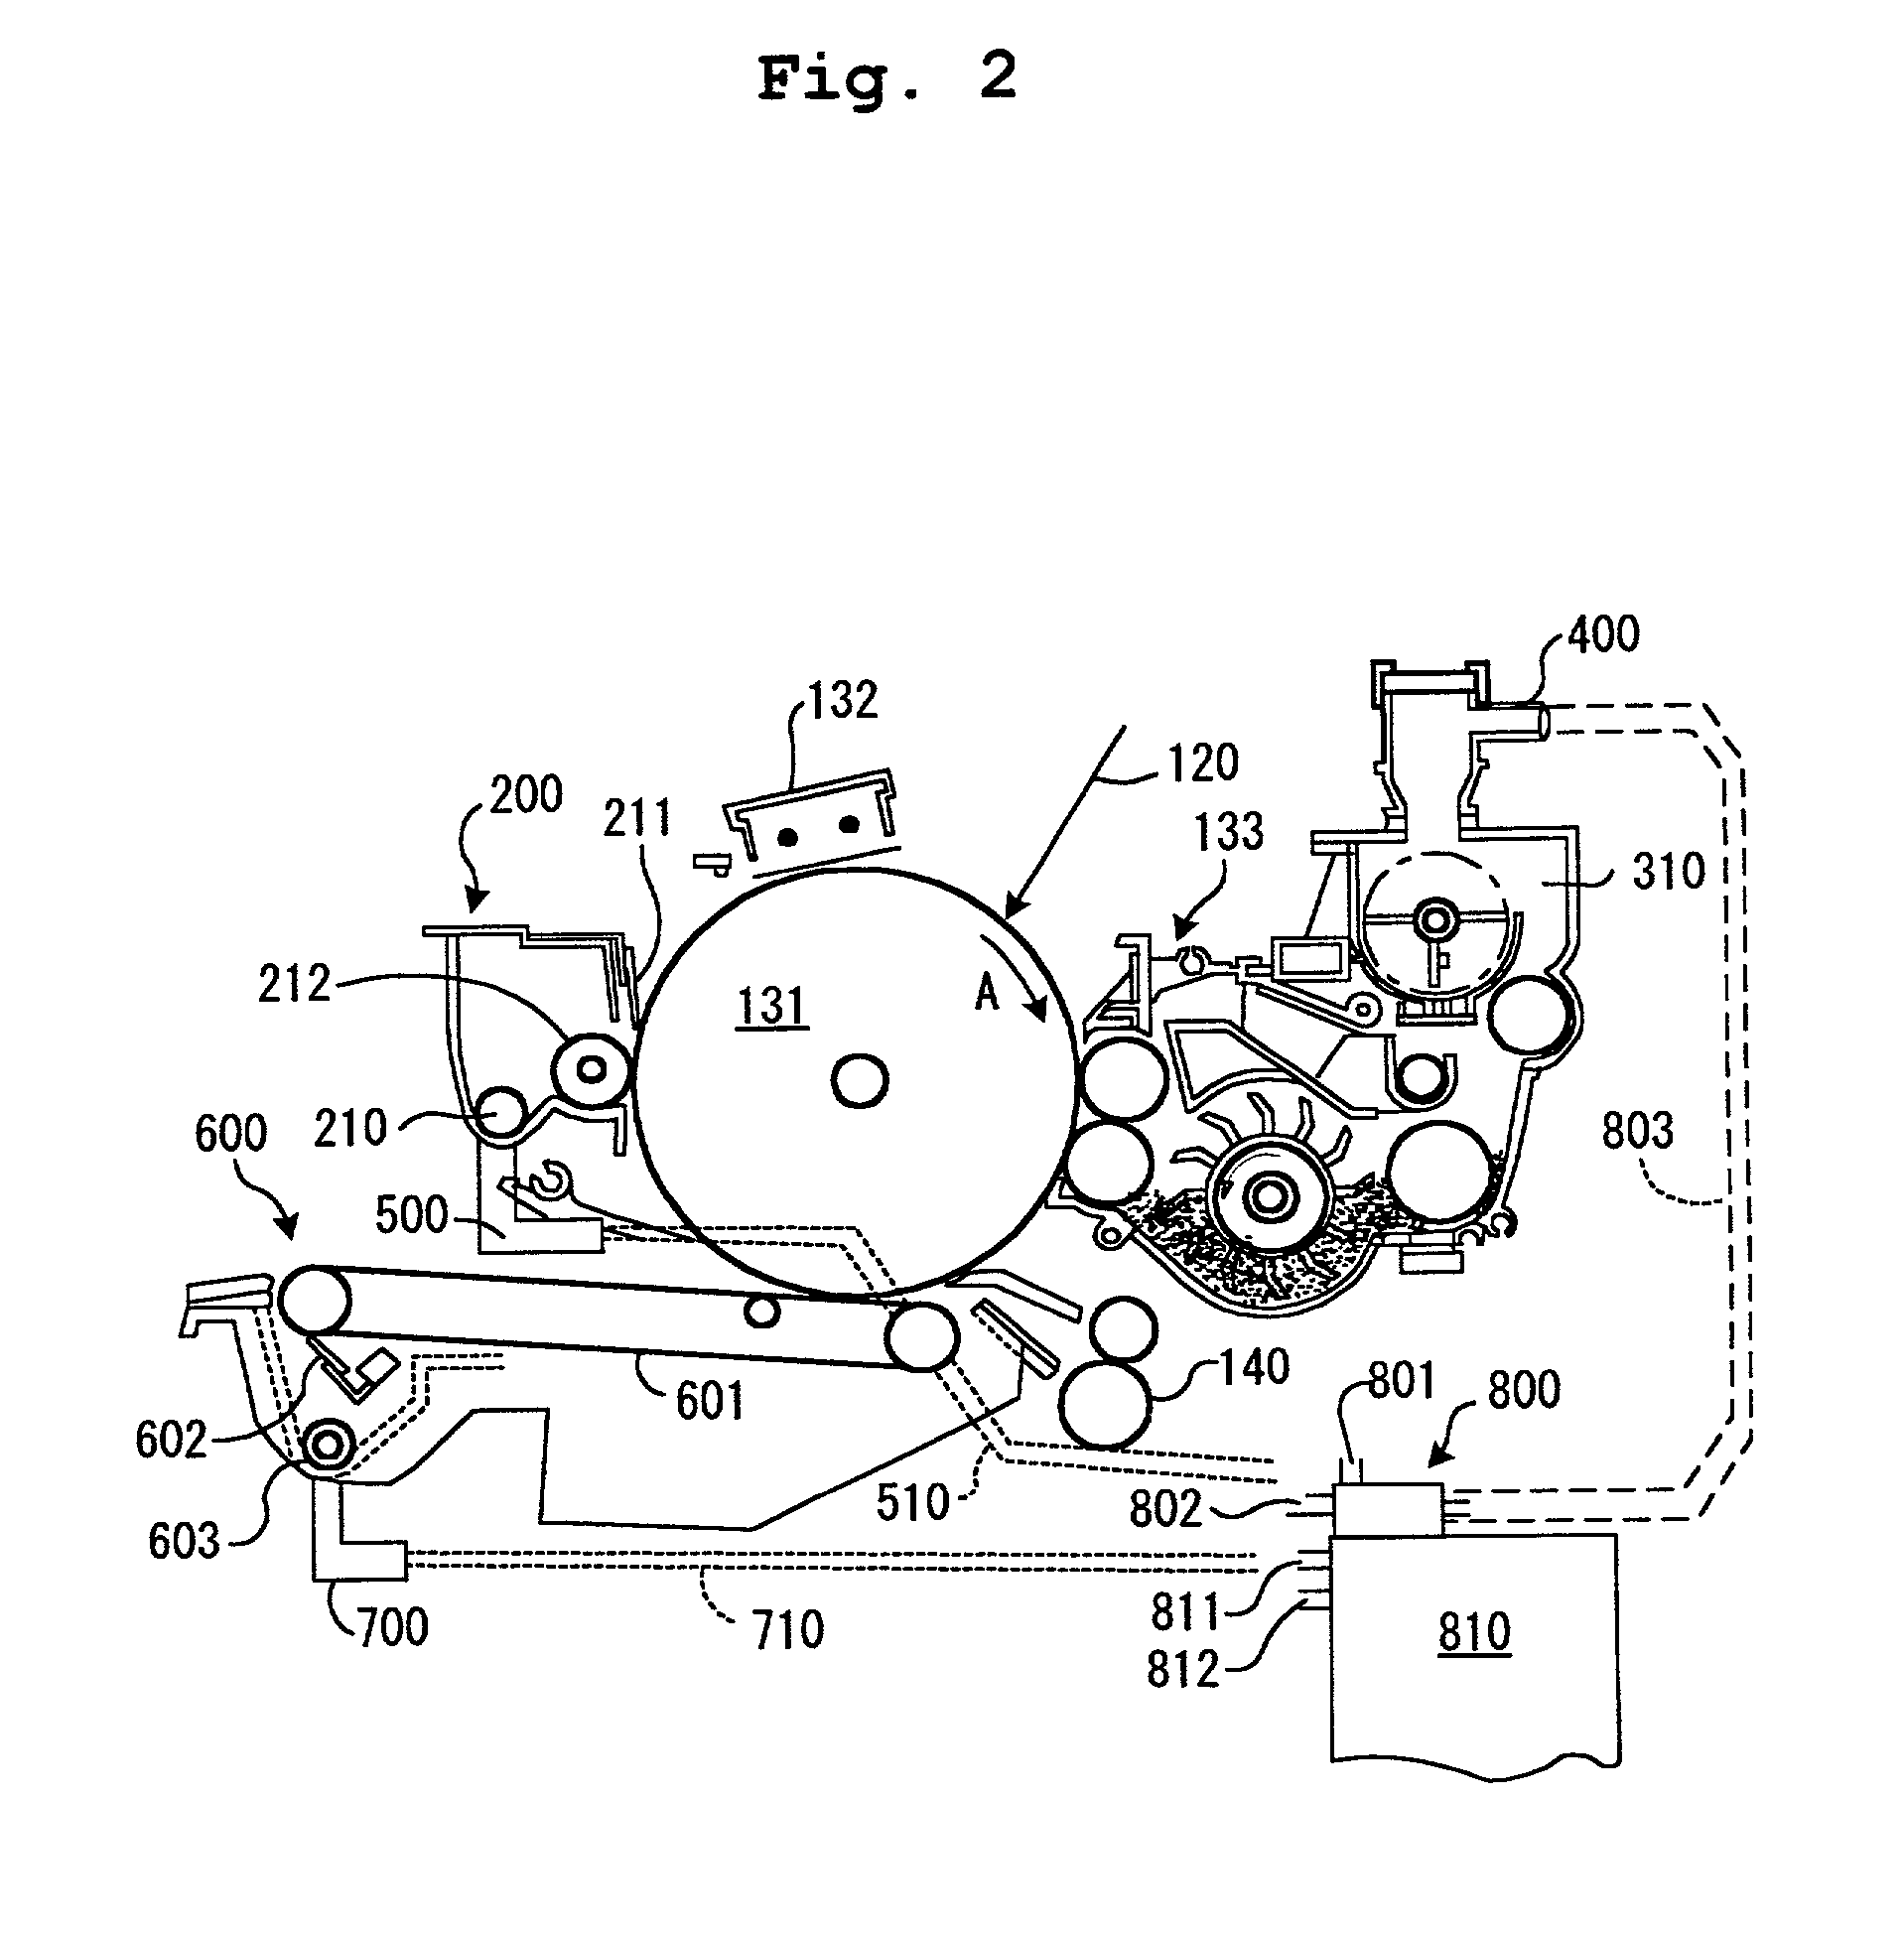 [DIAGRAM] Wiring Older Diagram Furnace 90 22673 06furnace